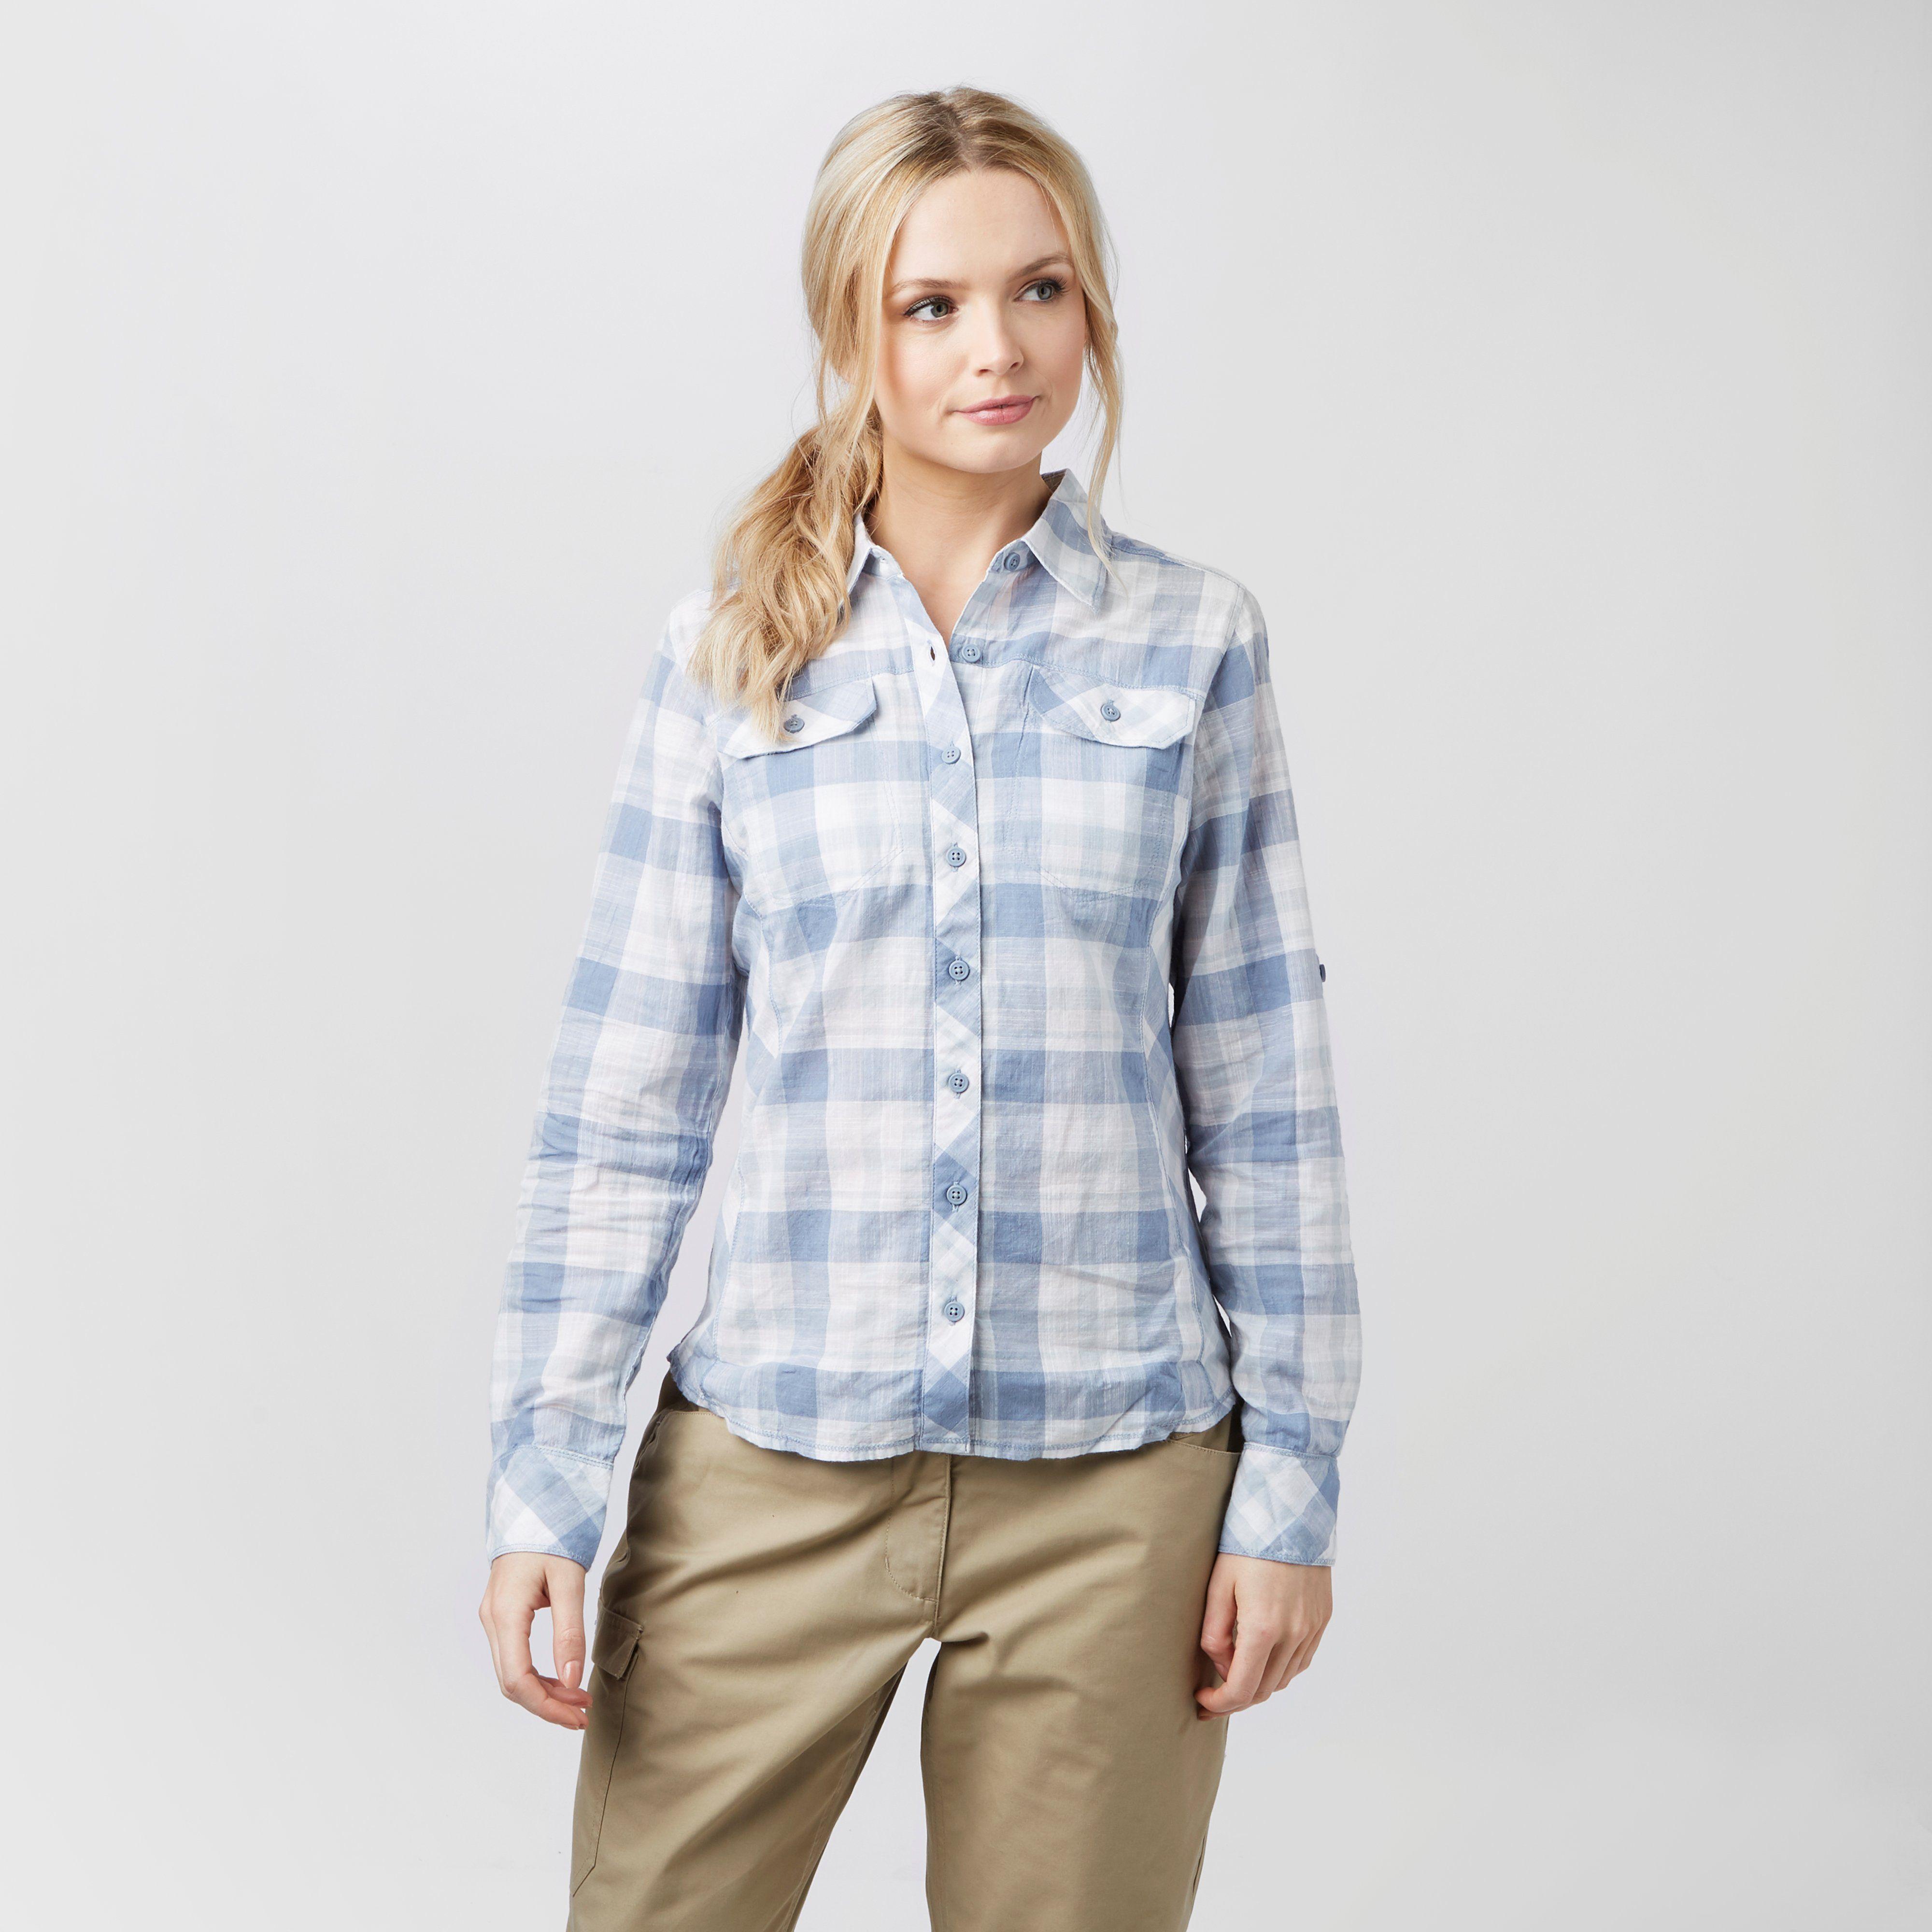 COLUMBIA Women's Camp Henry™ Long-Sleeve Shirt